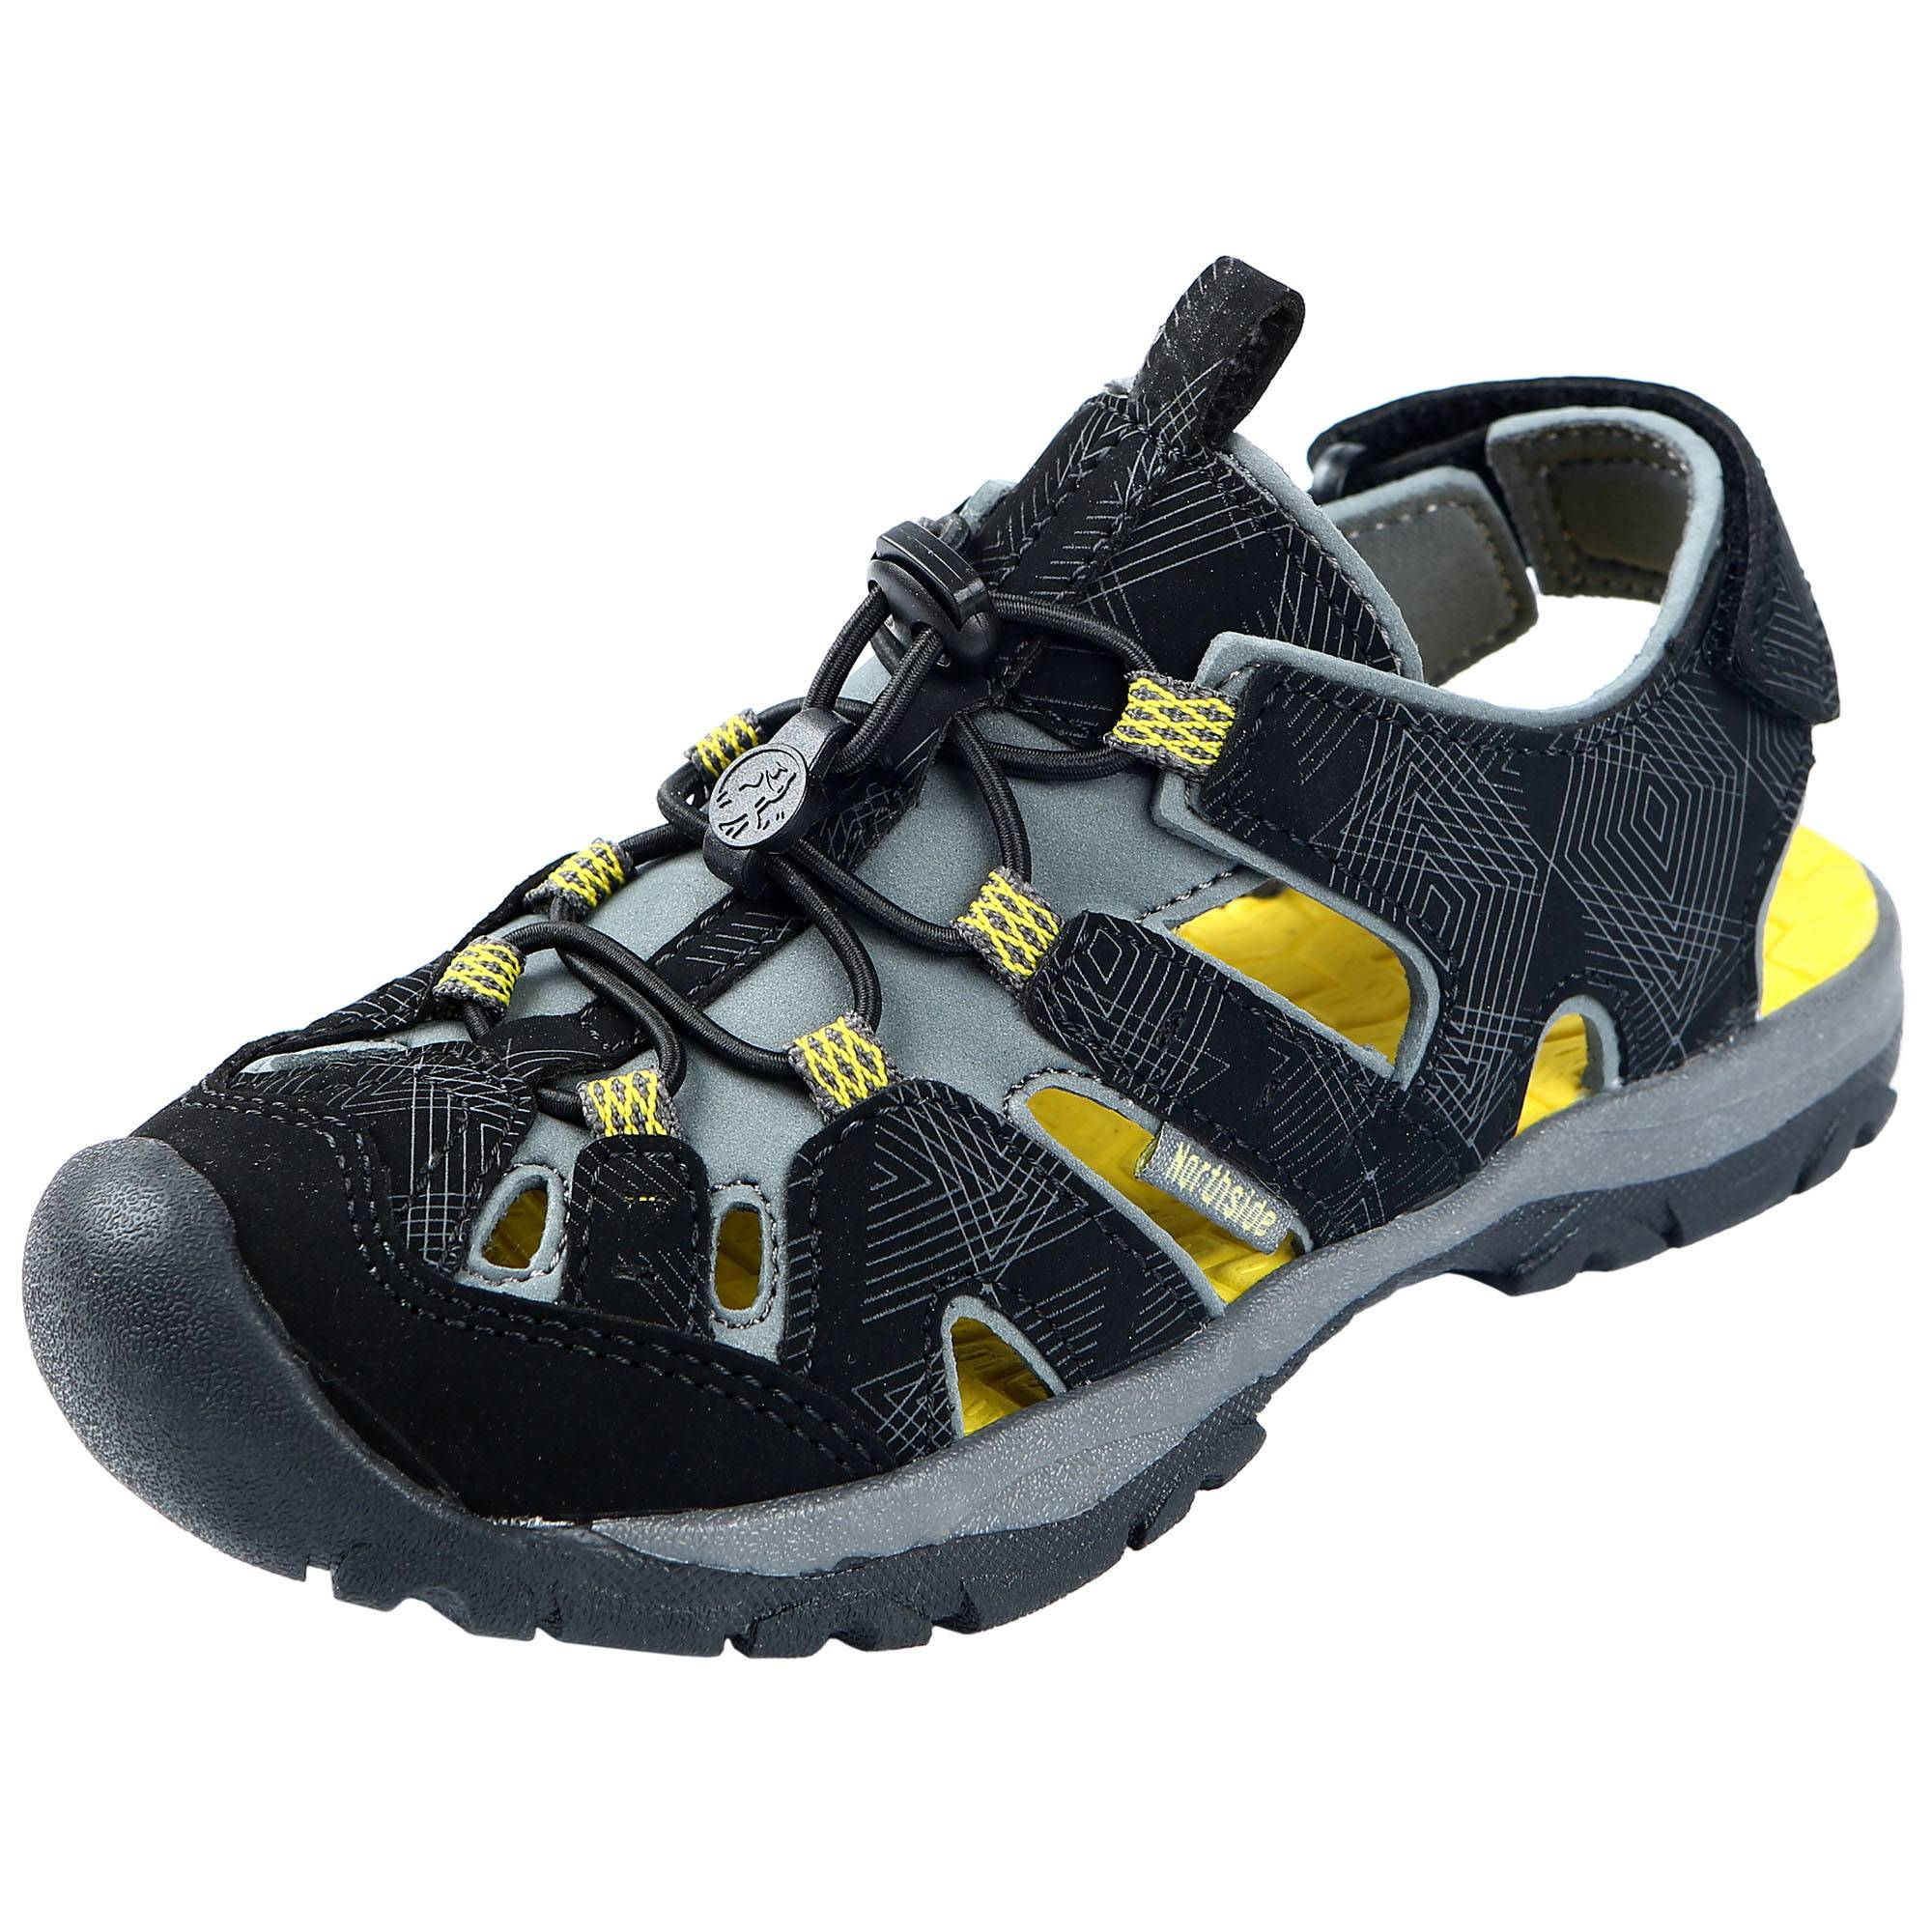 Northside Boy's Burke SE Sport Sandals  - Black/Yellow - Size: 5